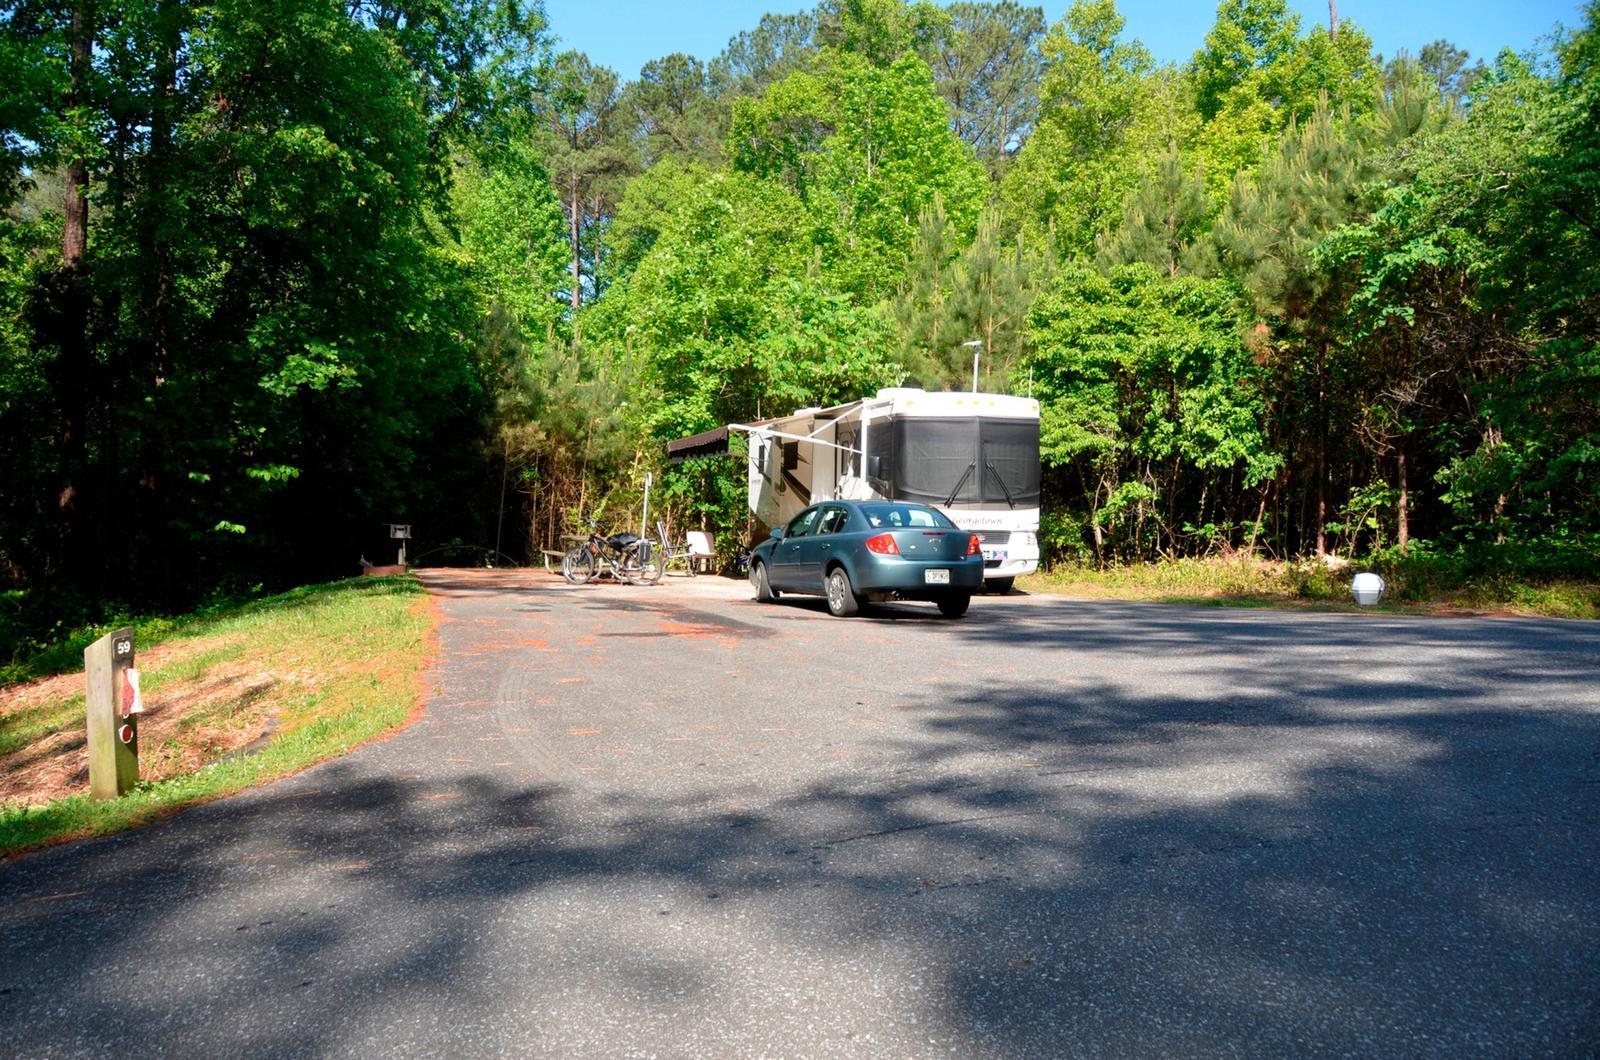 Driveway slopePayne Campground, campsite #59